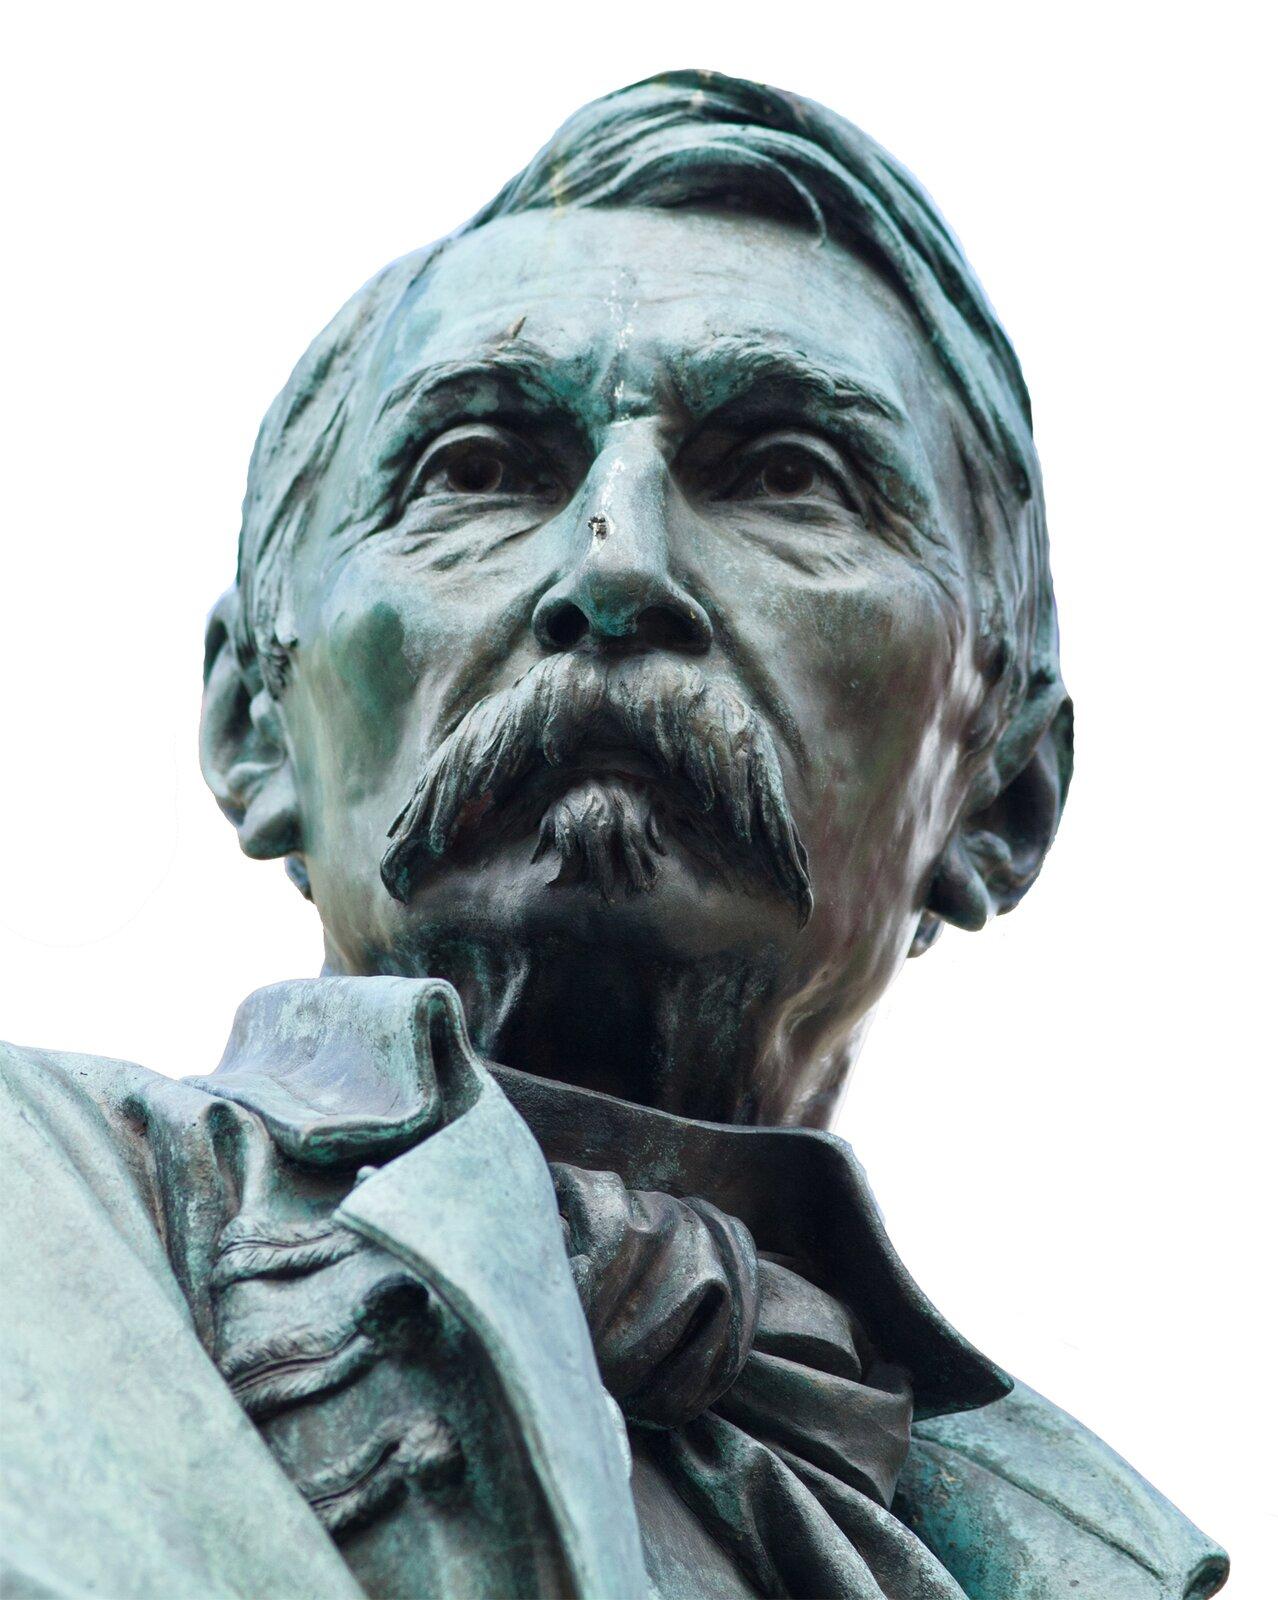 Leonard Marconi, pomnik Aleksandra Fredry, 1879; tu: zdjęcie zWrocławia Leonard Marconi, pomnik Aleksandra Fredry, 1879; tu: zdjęcie zWrocławia Źródło: Małgorzata Skibińska, Contentplus.pl sp. zo.o., fotografia barwna.